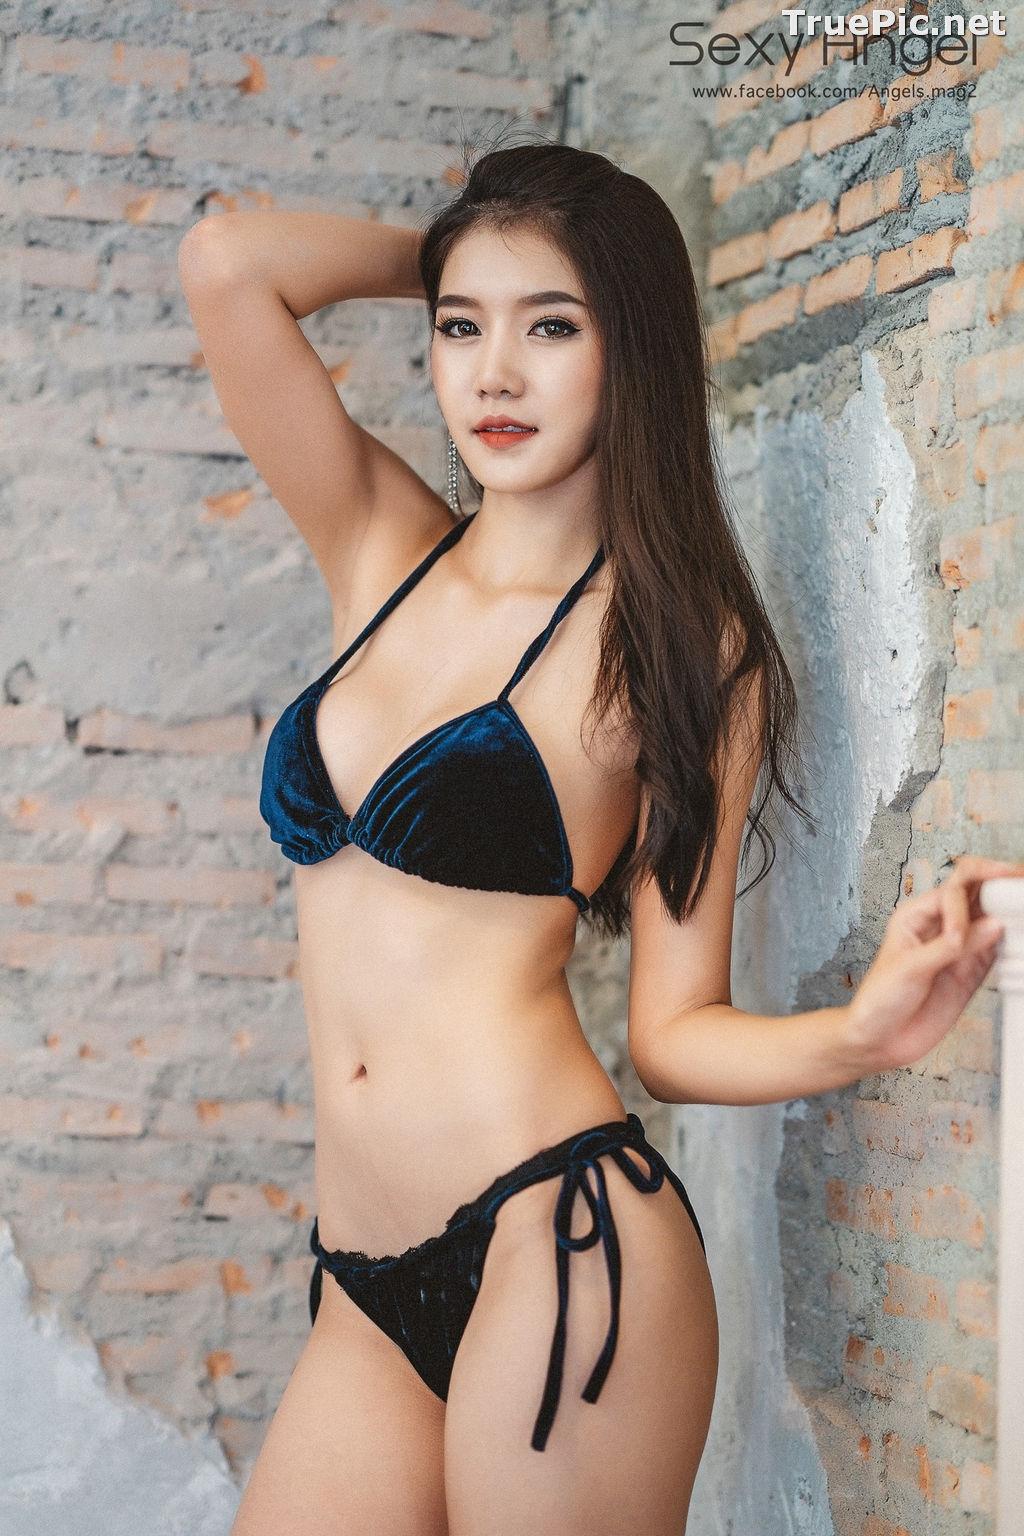 Image Thailand Model - Saruda Chalermsaen (EveAva) - Sexy Bikini Angel - TruePic.net - Picture-1